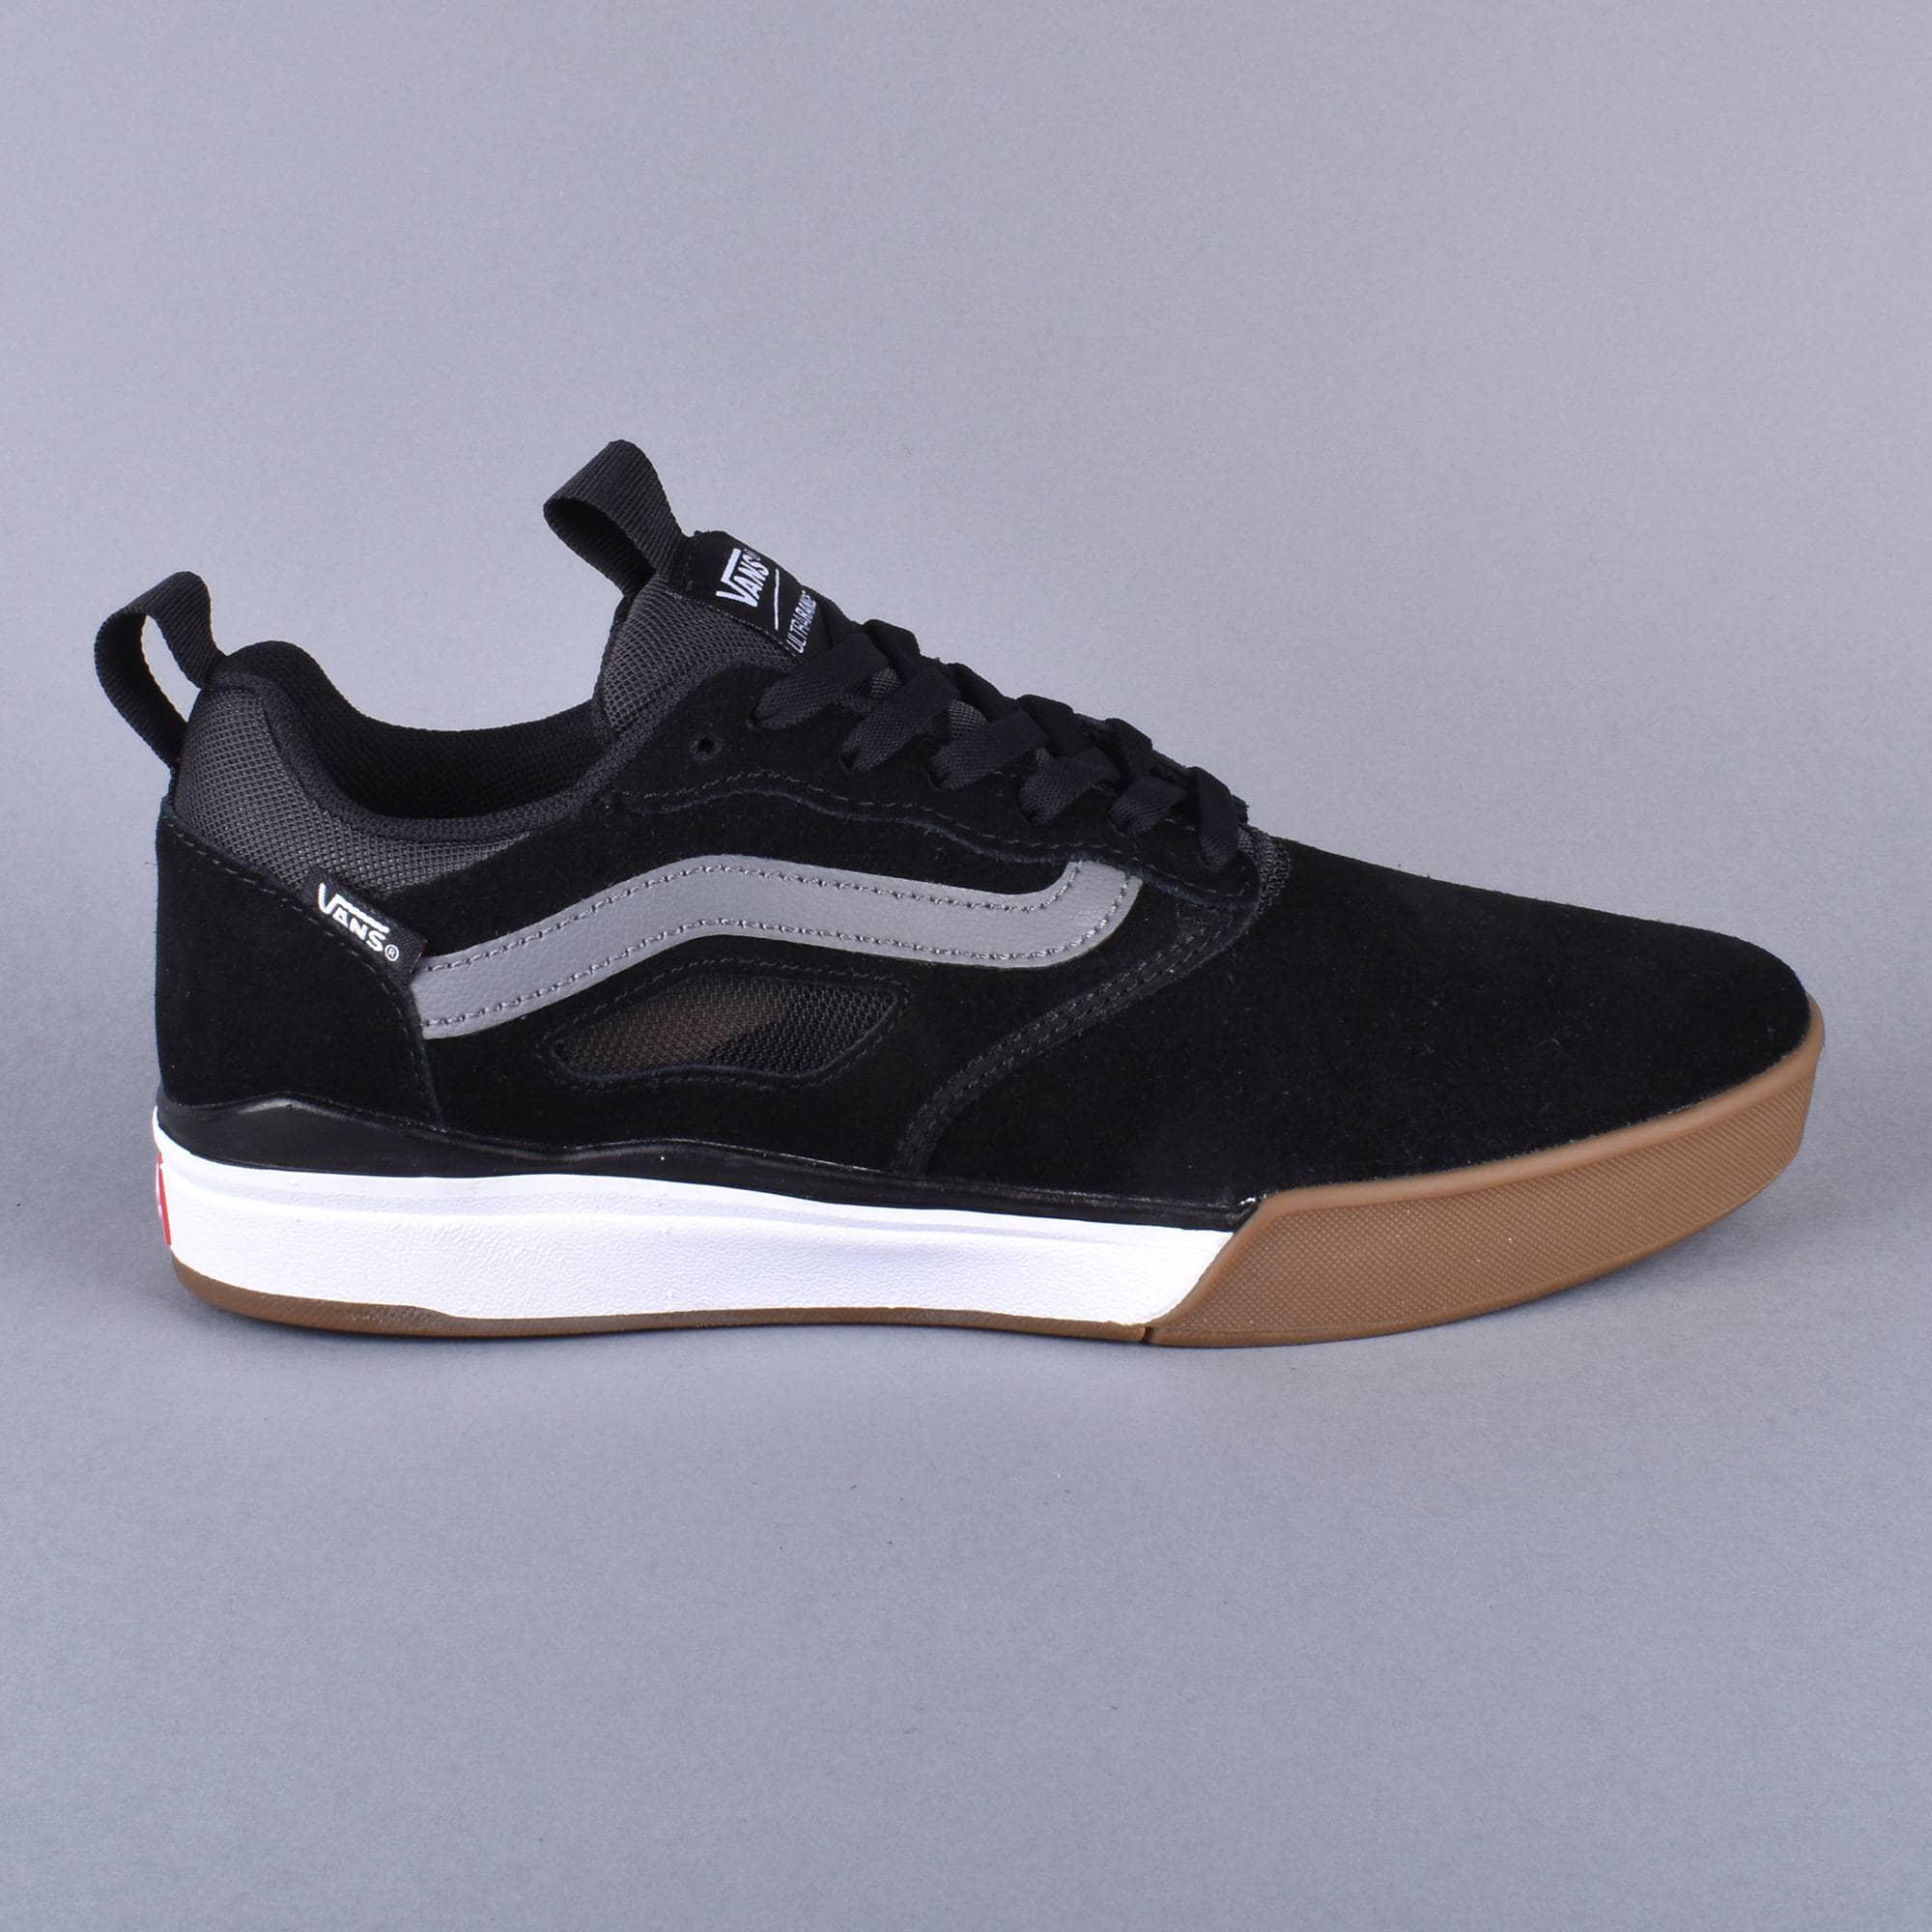 Vans Ultrarange Pro Skate Shoes - Black